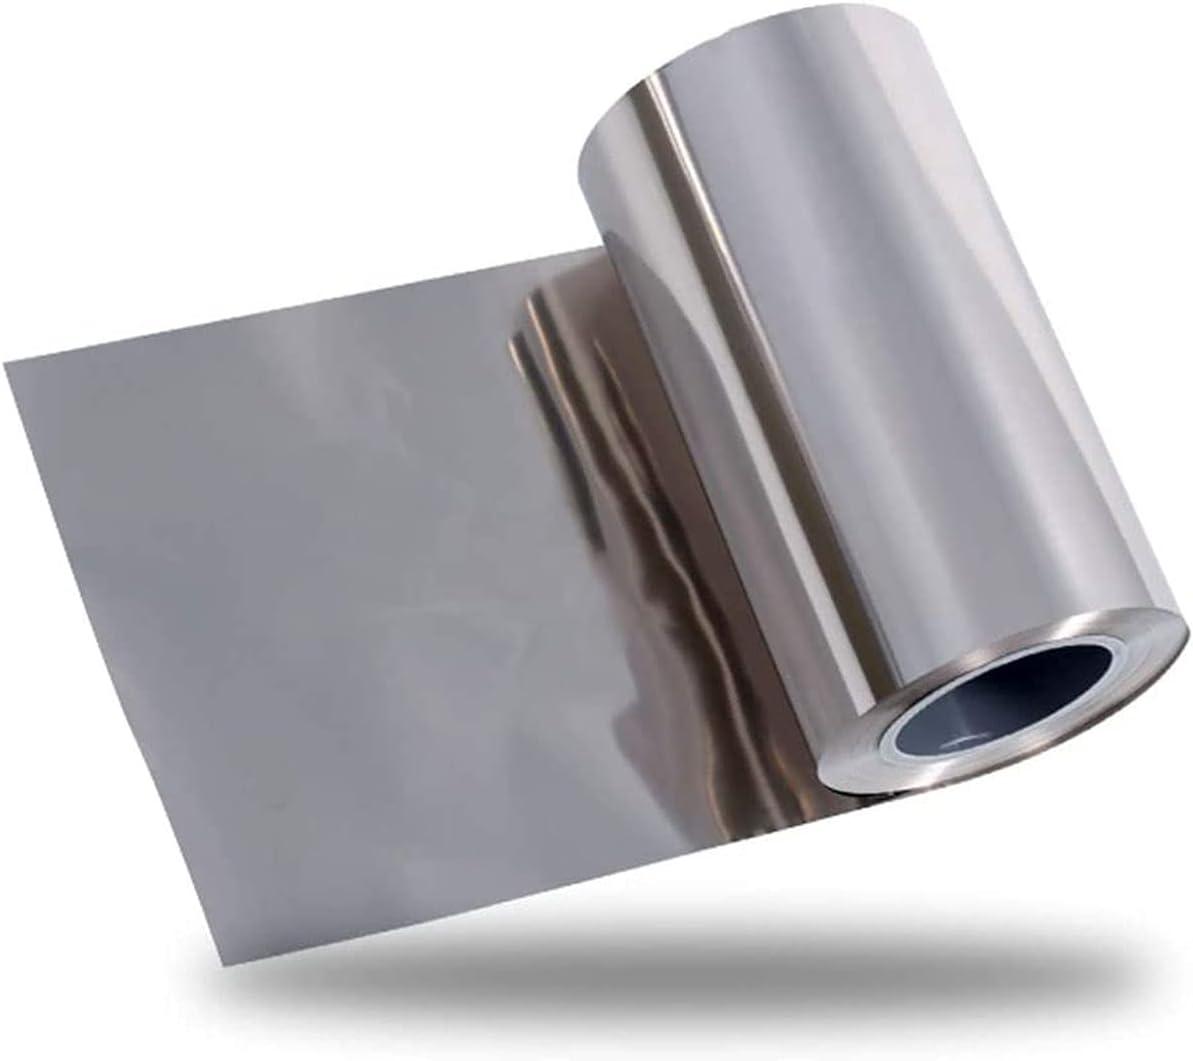 LEISHENT Pure Nickel Las Vegas Mall Plate Minneapolis Mall Sheet 150mm 0.03mm 1000mm Foil X